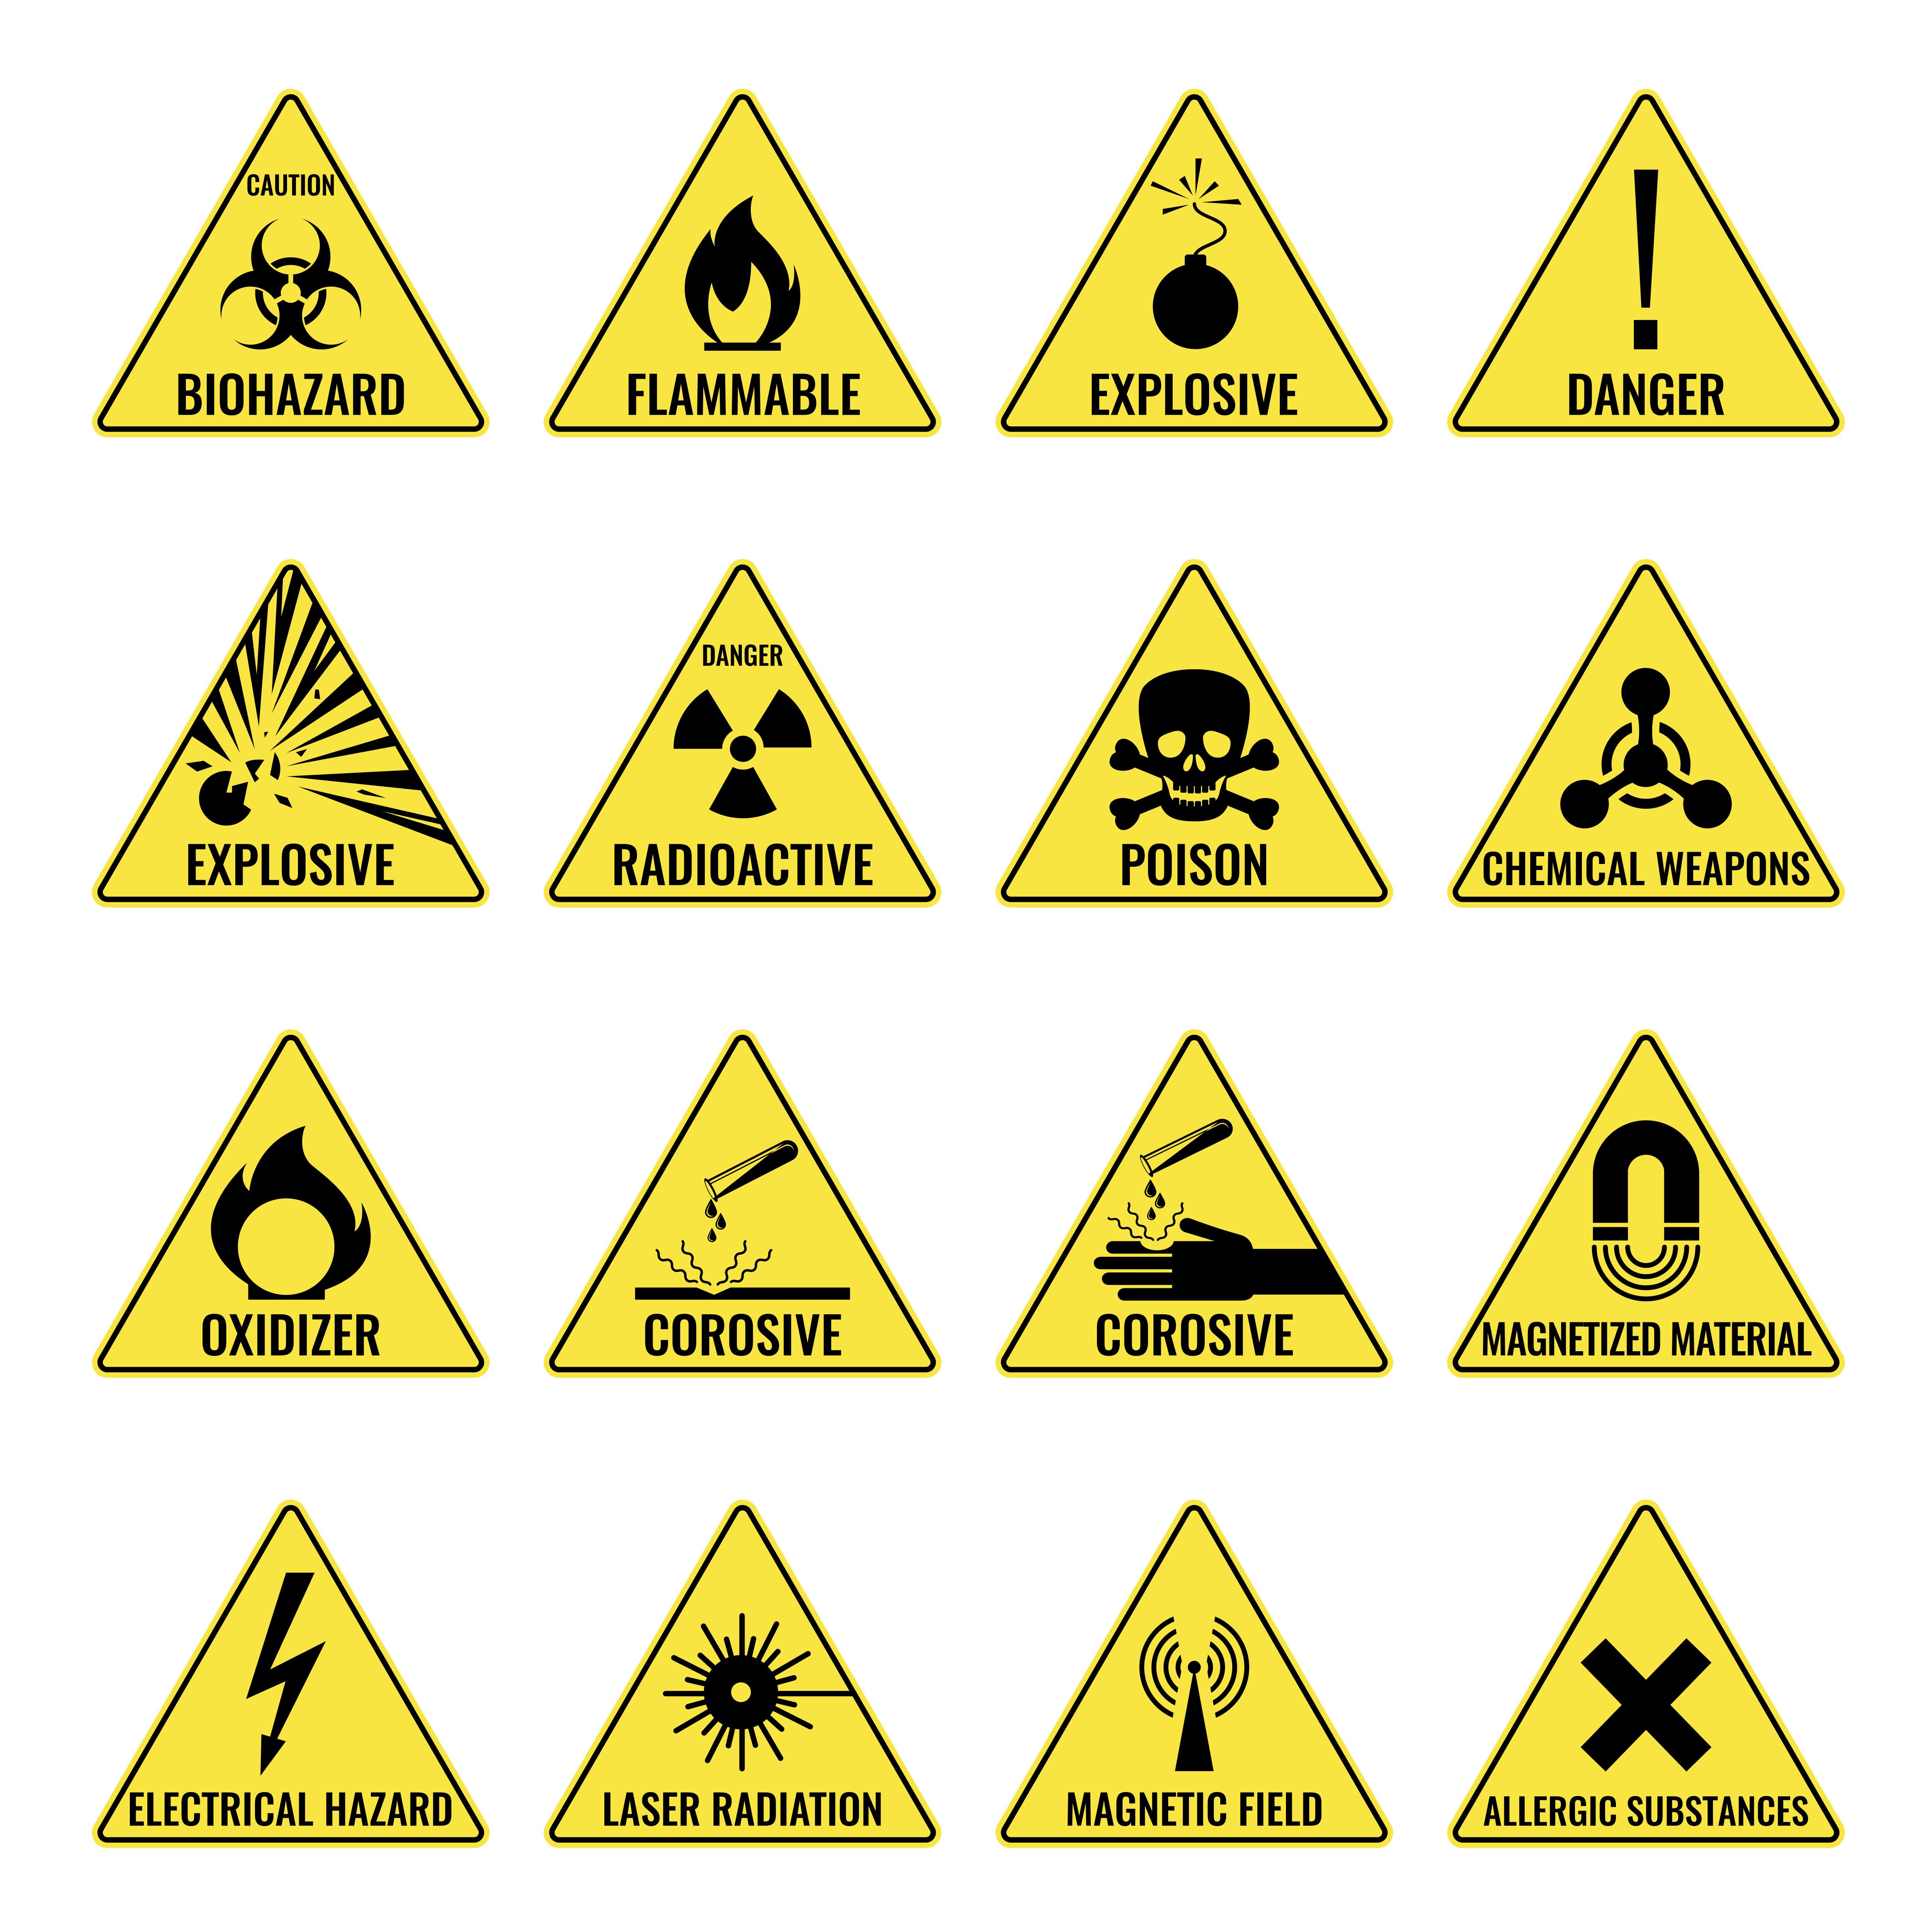 biohazard_2.jpg